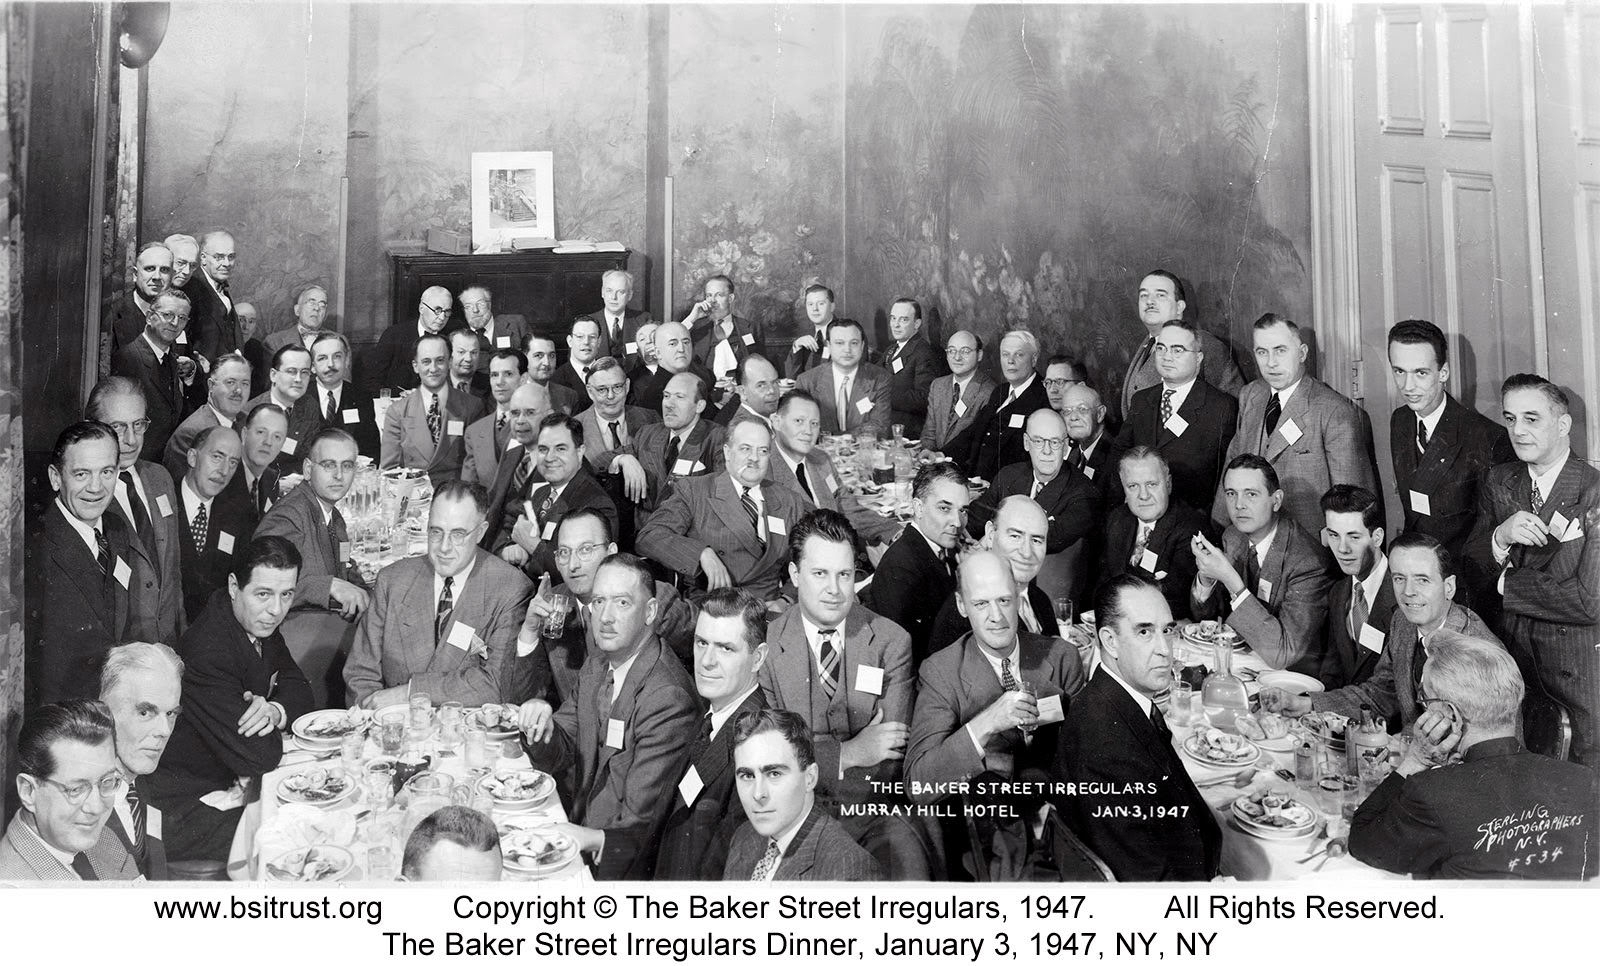 The 1947 BSI Dinner group photo